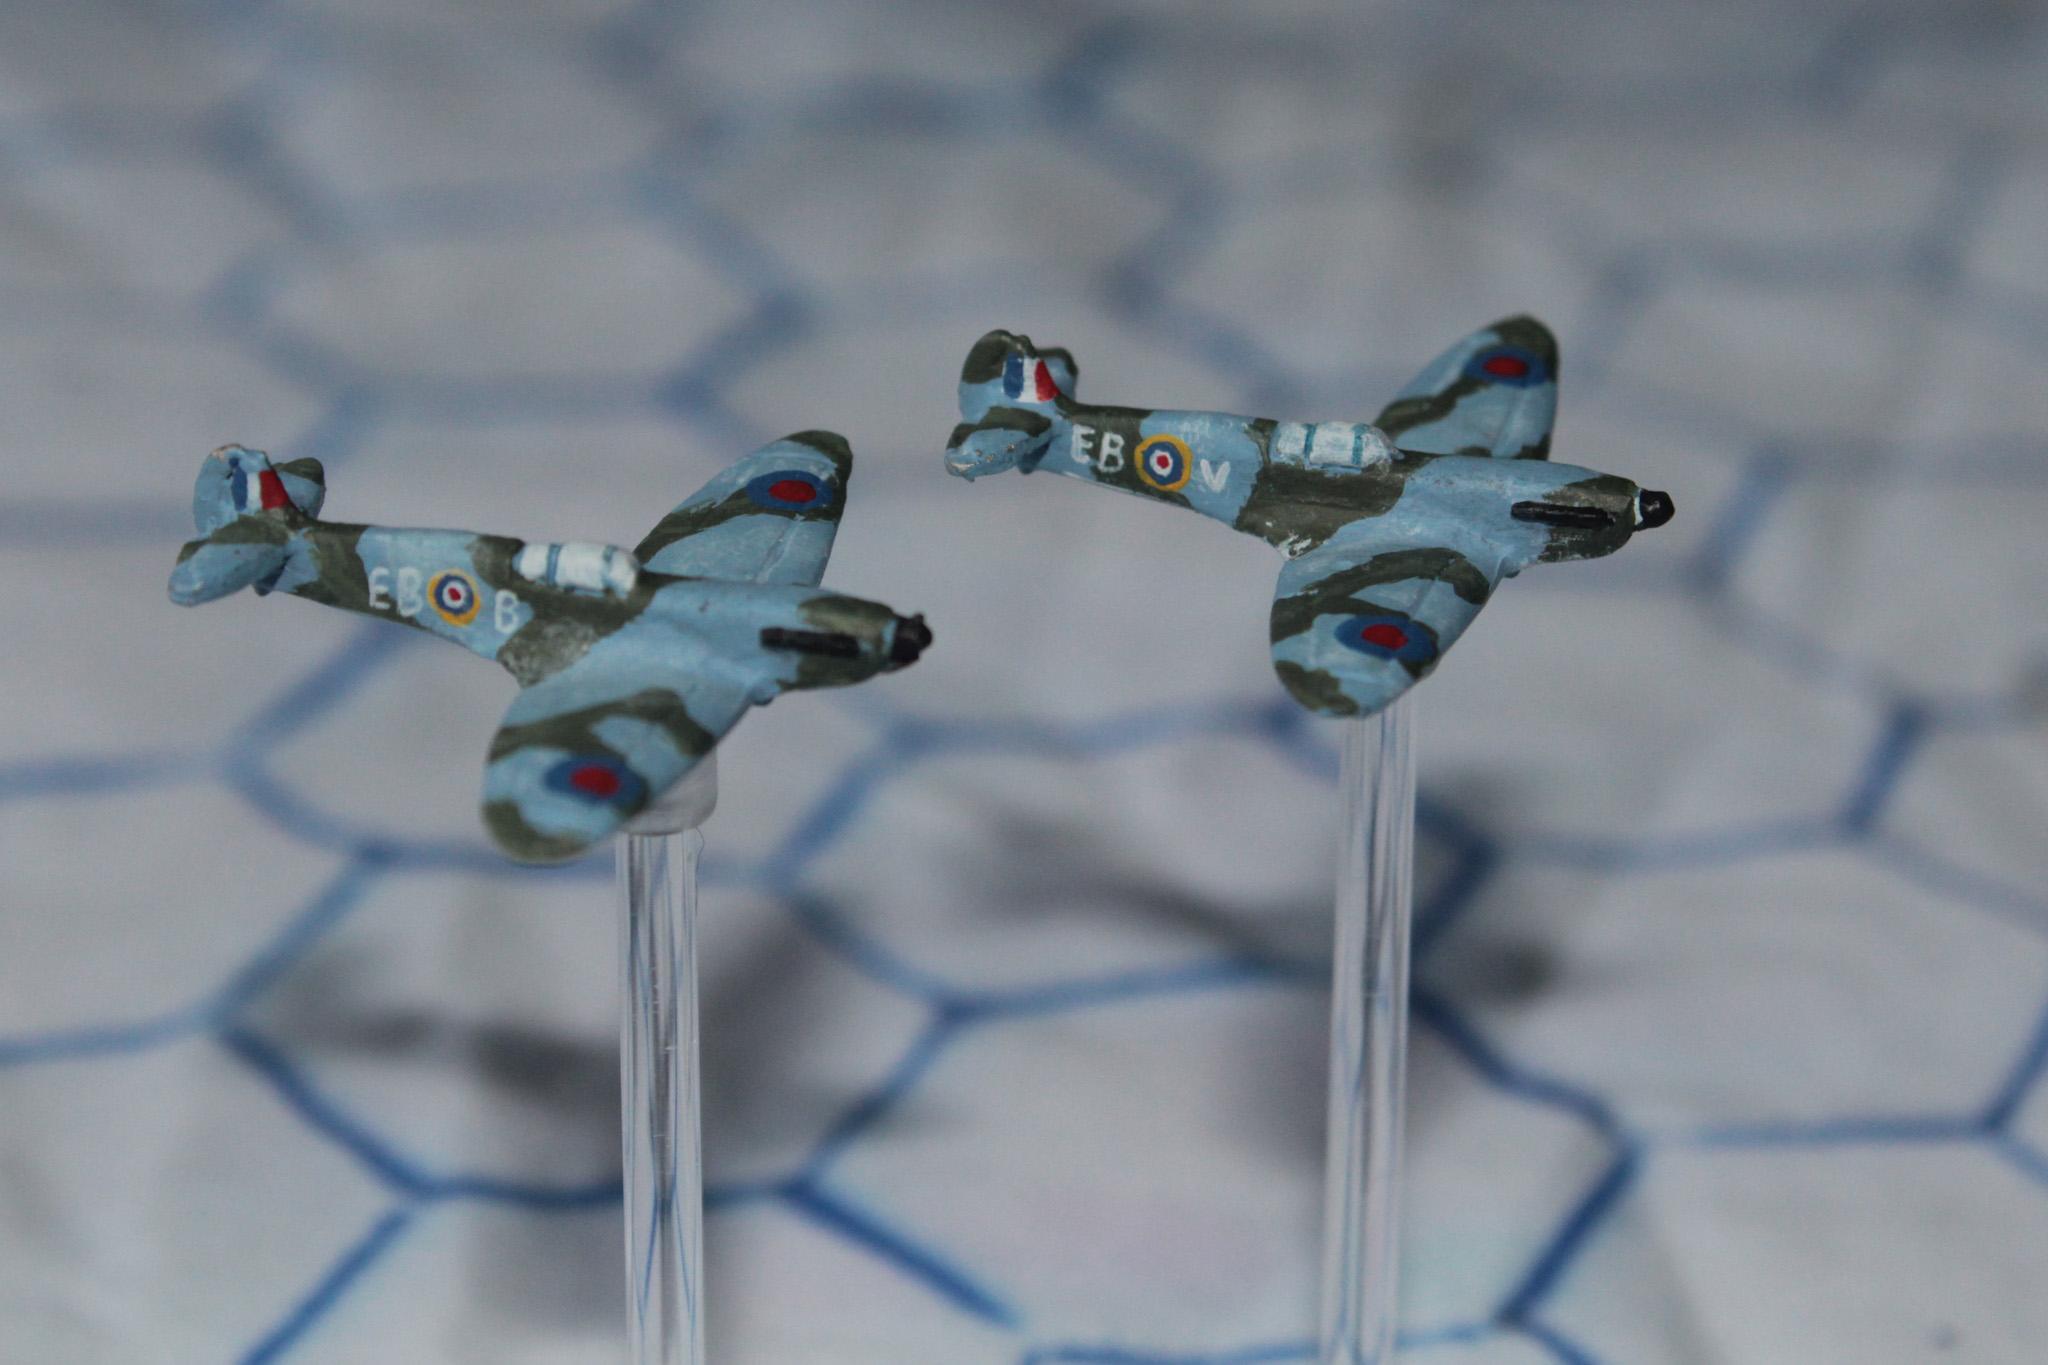 1:300, 6mm, Airborne, Aircraft, Airplane, Aviation, Check Your 6!, Fliers, Plane, Planes, Raf, Spitfire, World War 2